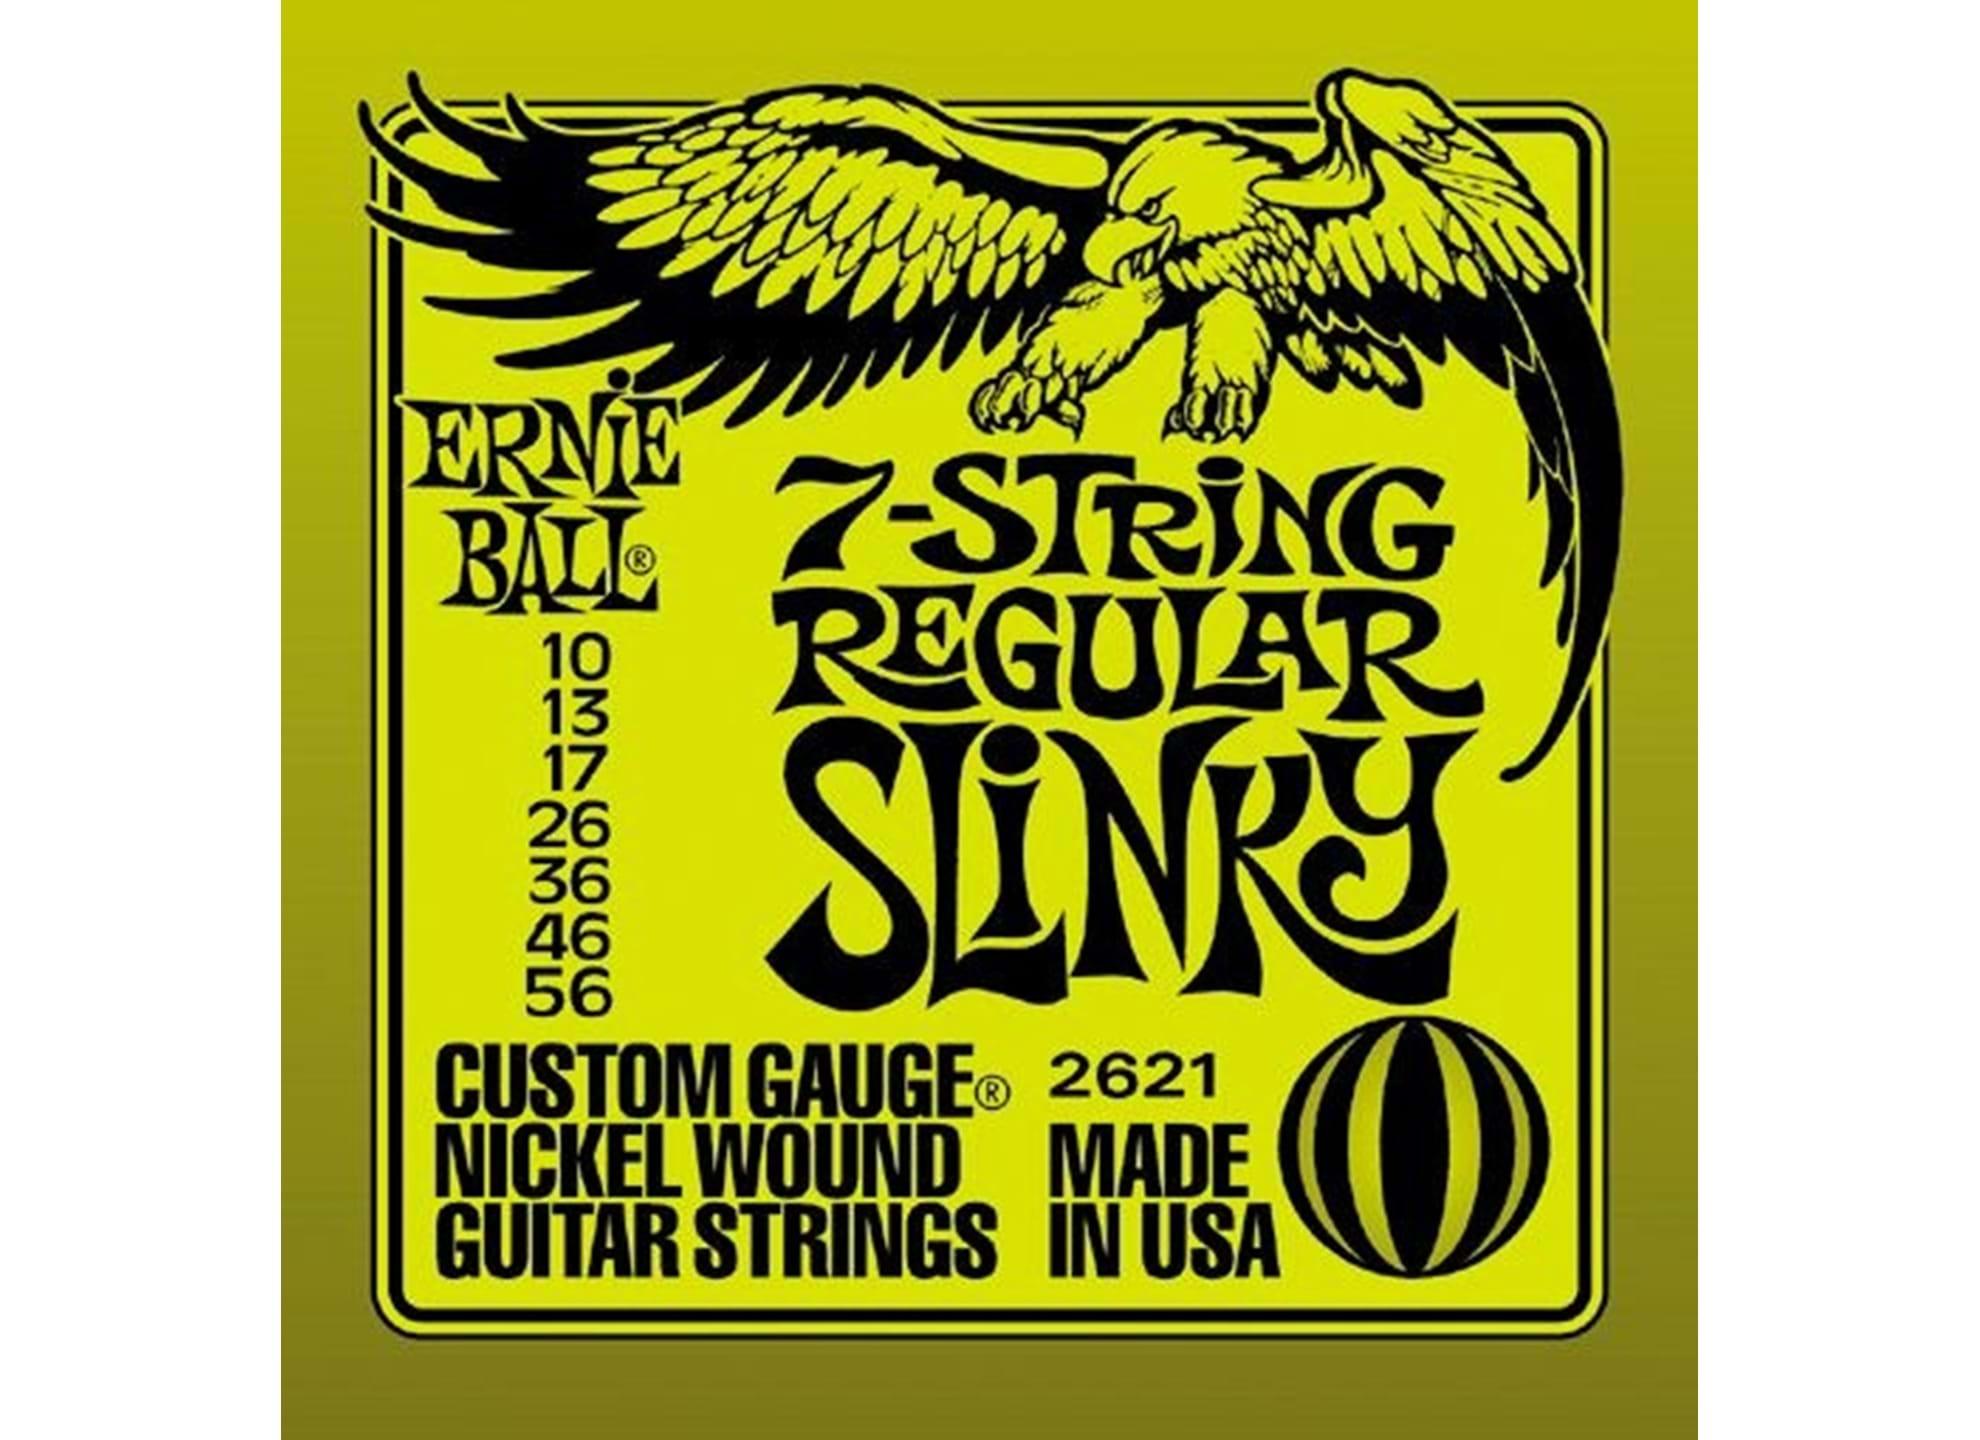 010-056 Regular Slinky 7-string 2621